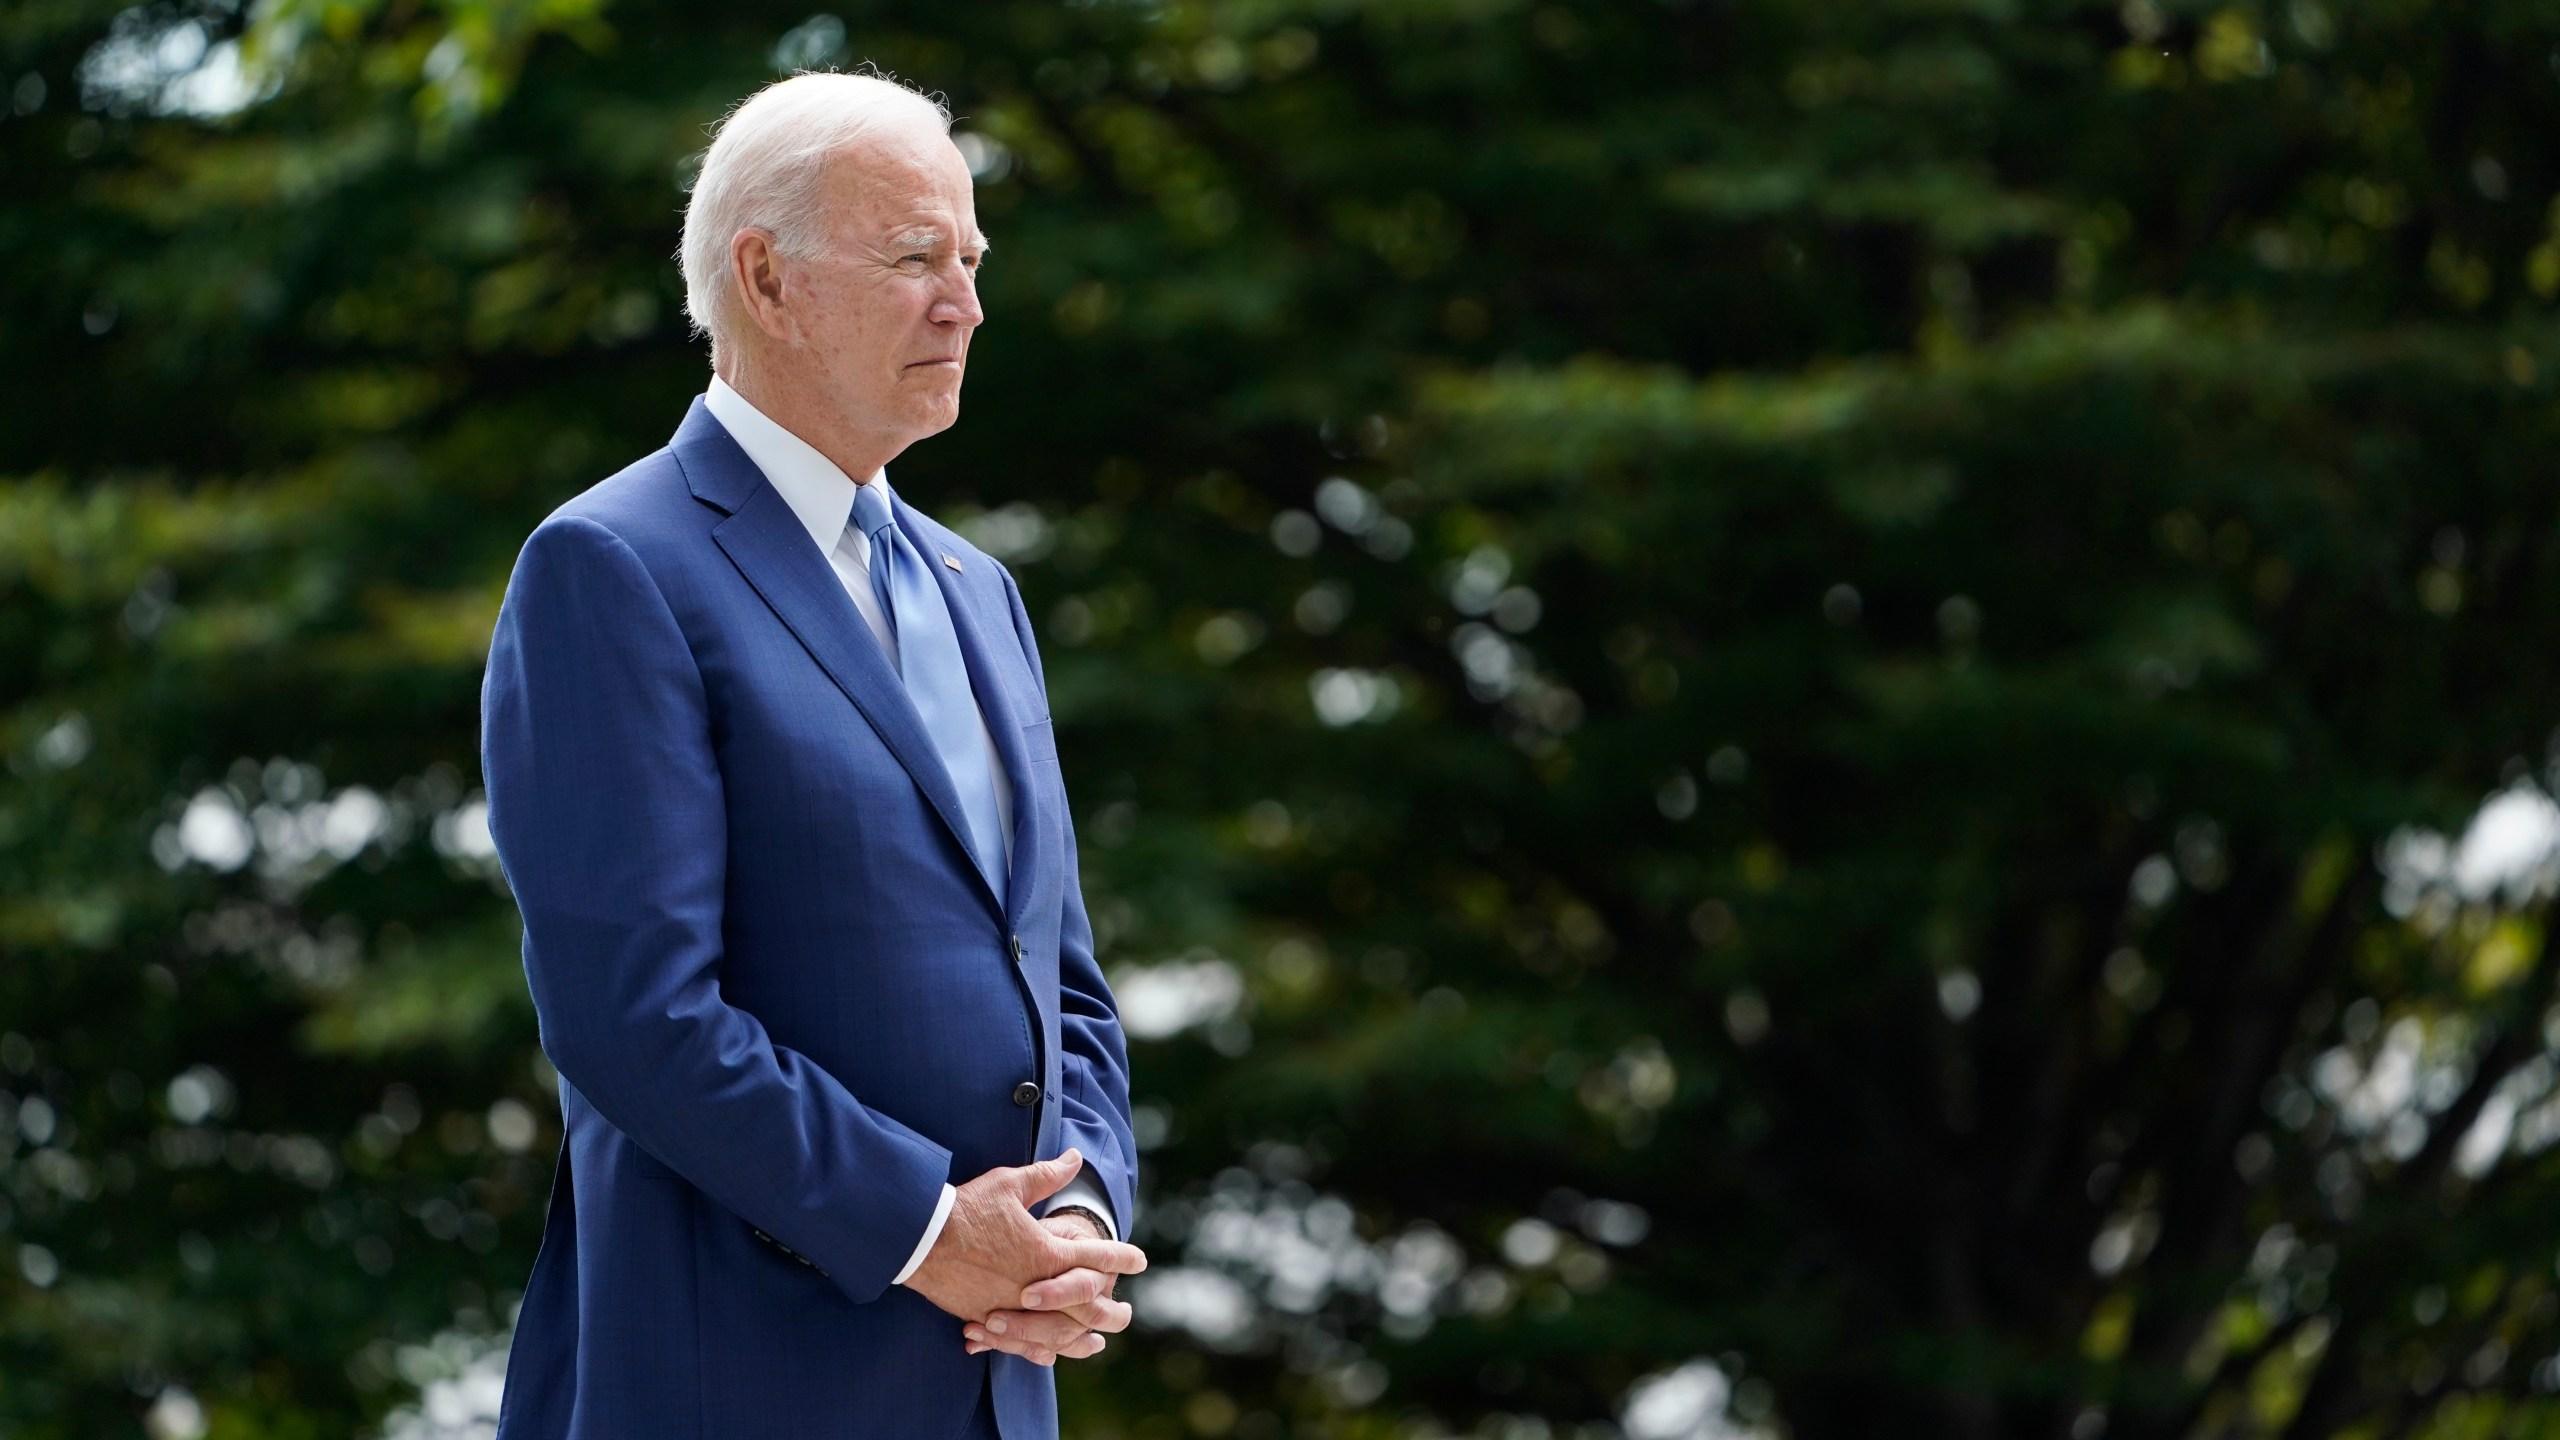 Biden won't invoke executive privilege on Trump Jan. 6 docs